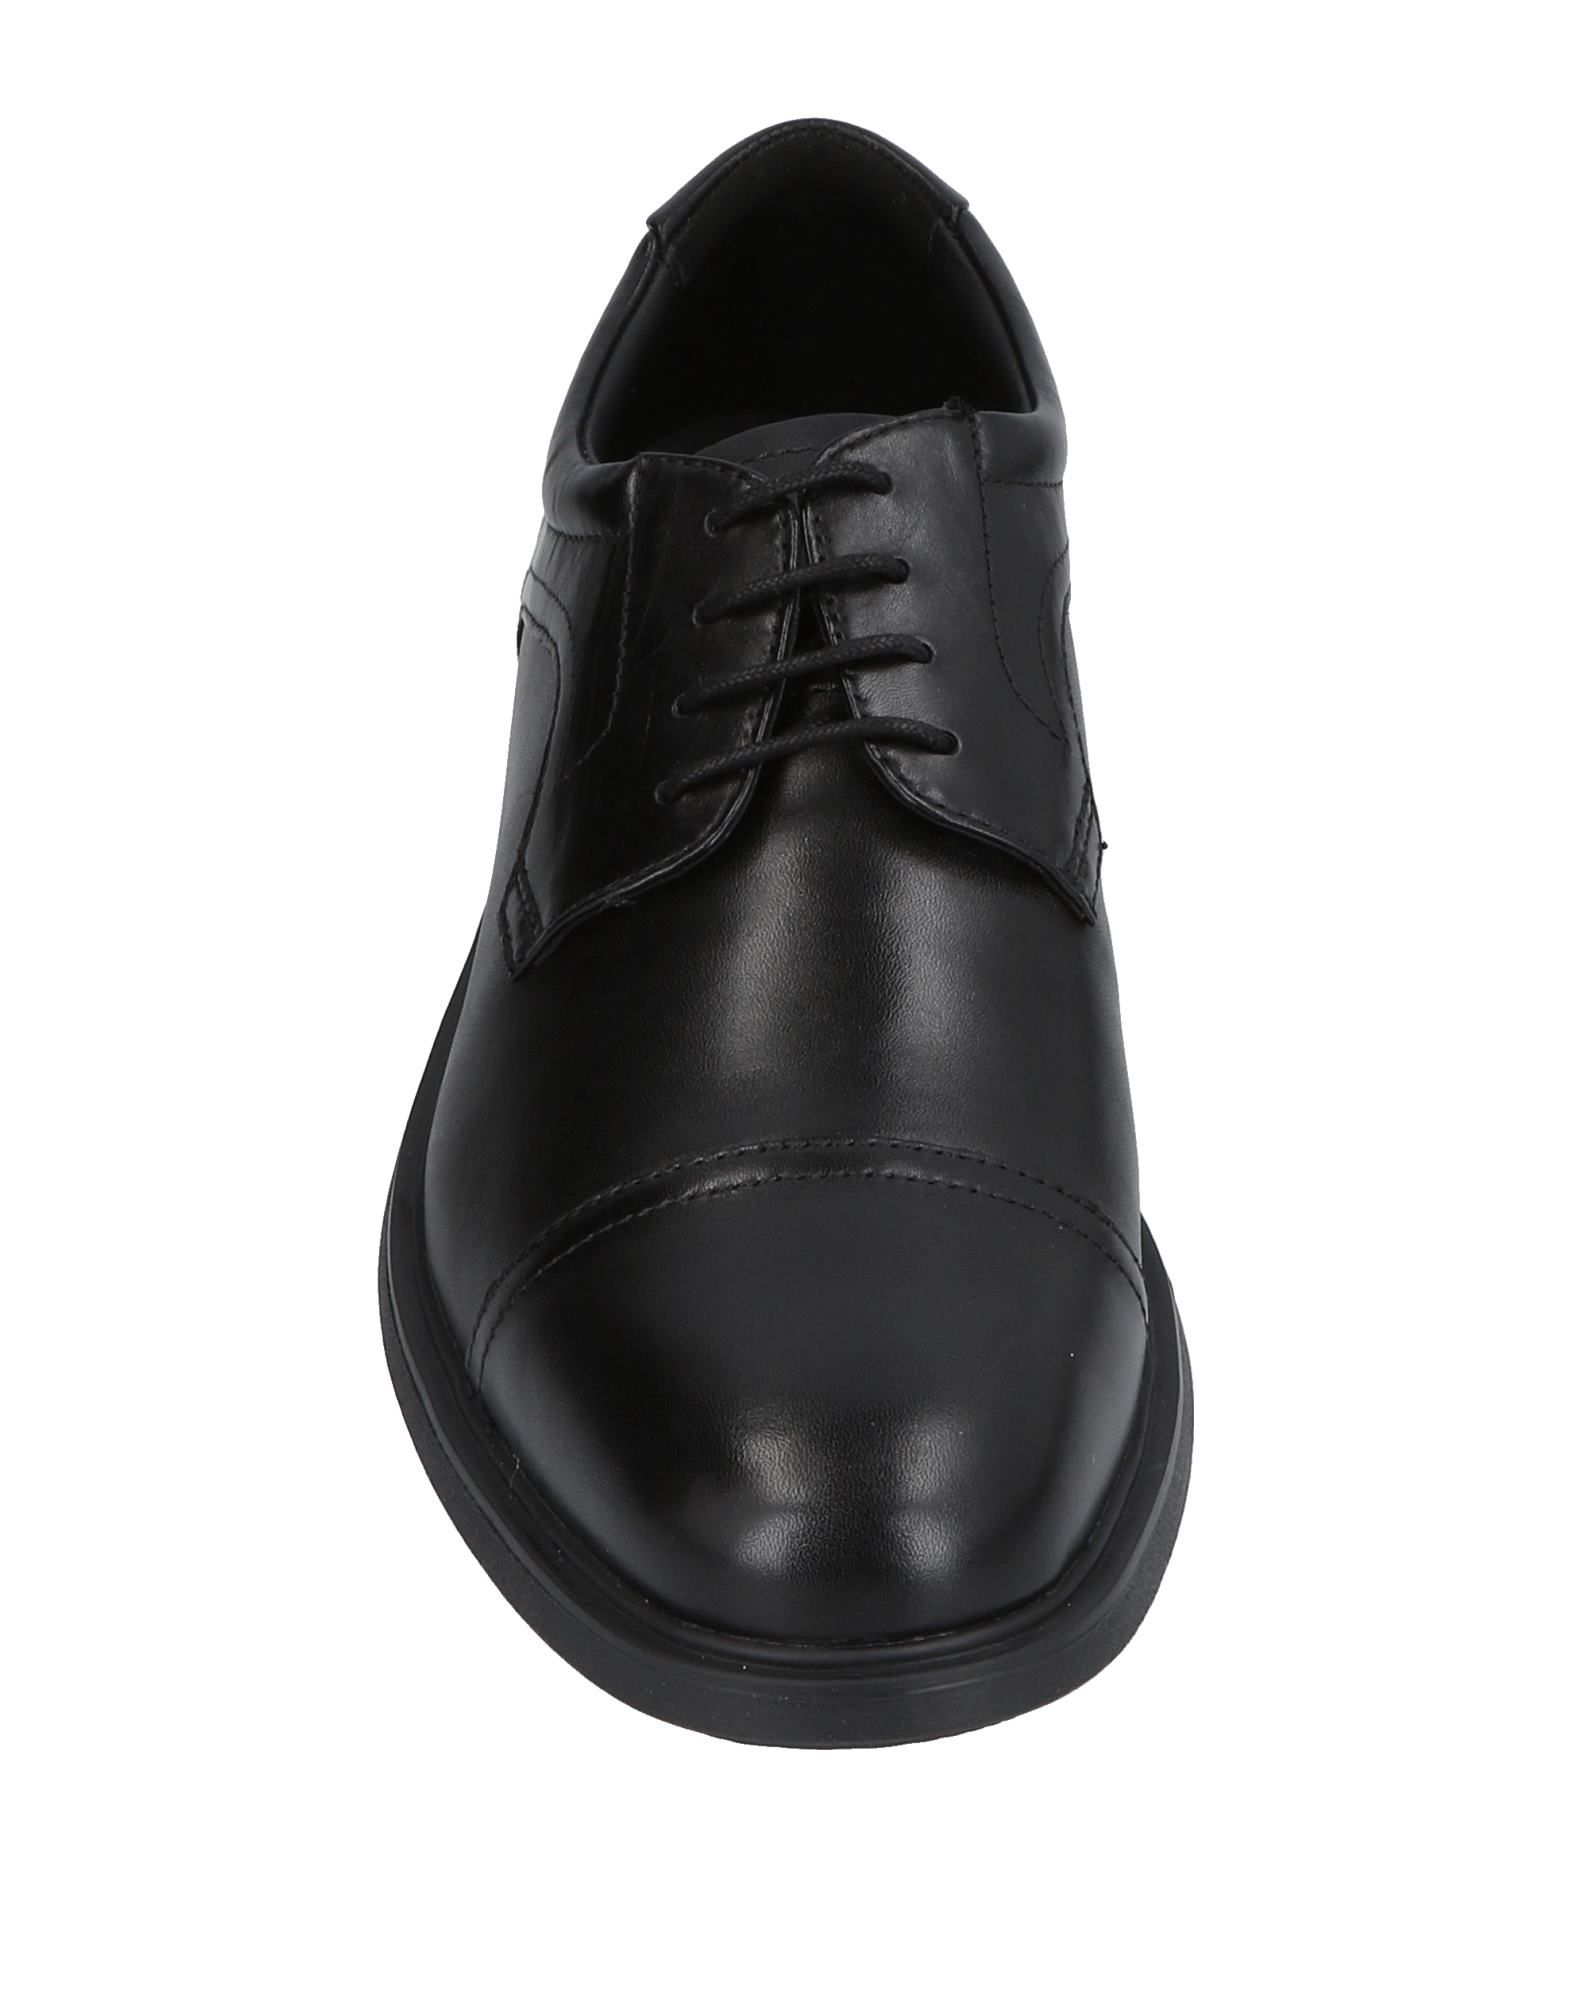 Herren Geox Schnürschuhe Herren   11439478SW Heiße Schuhe 3345e9